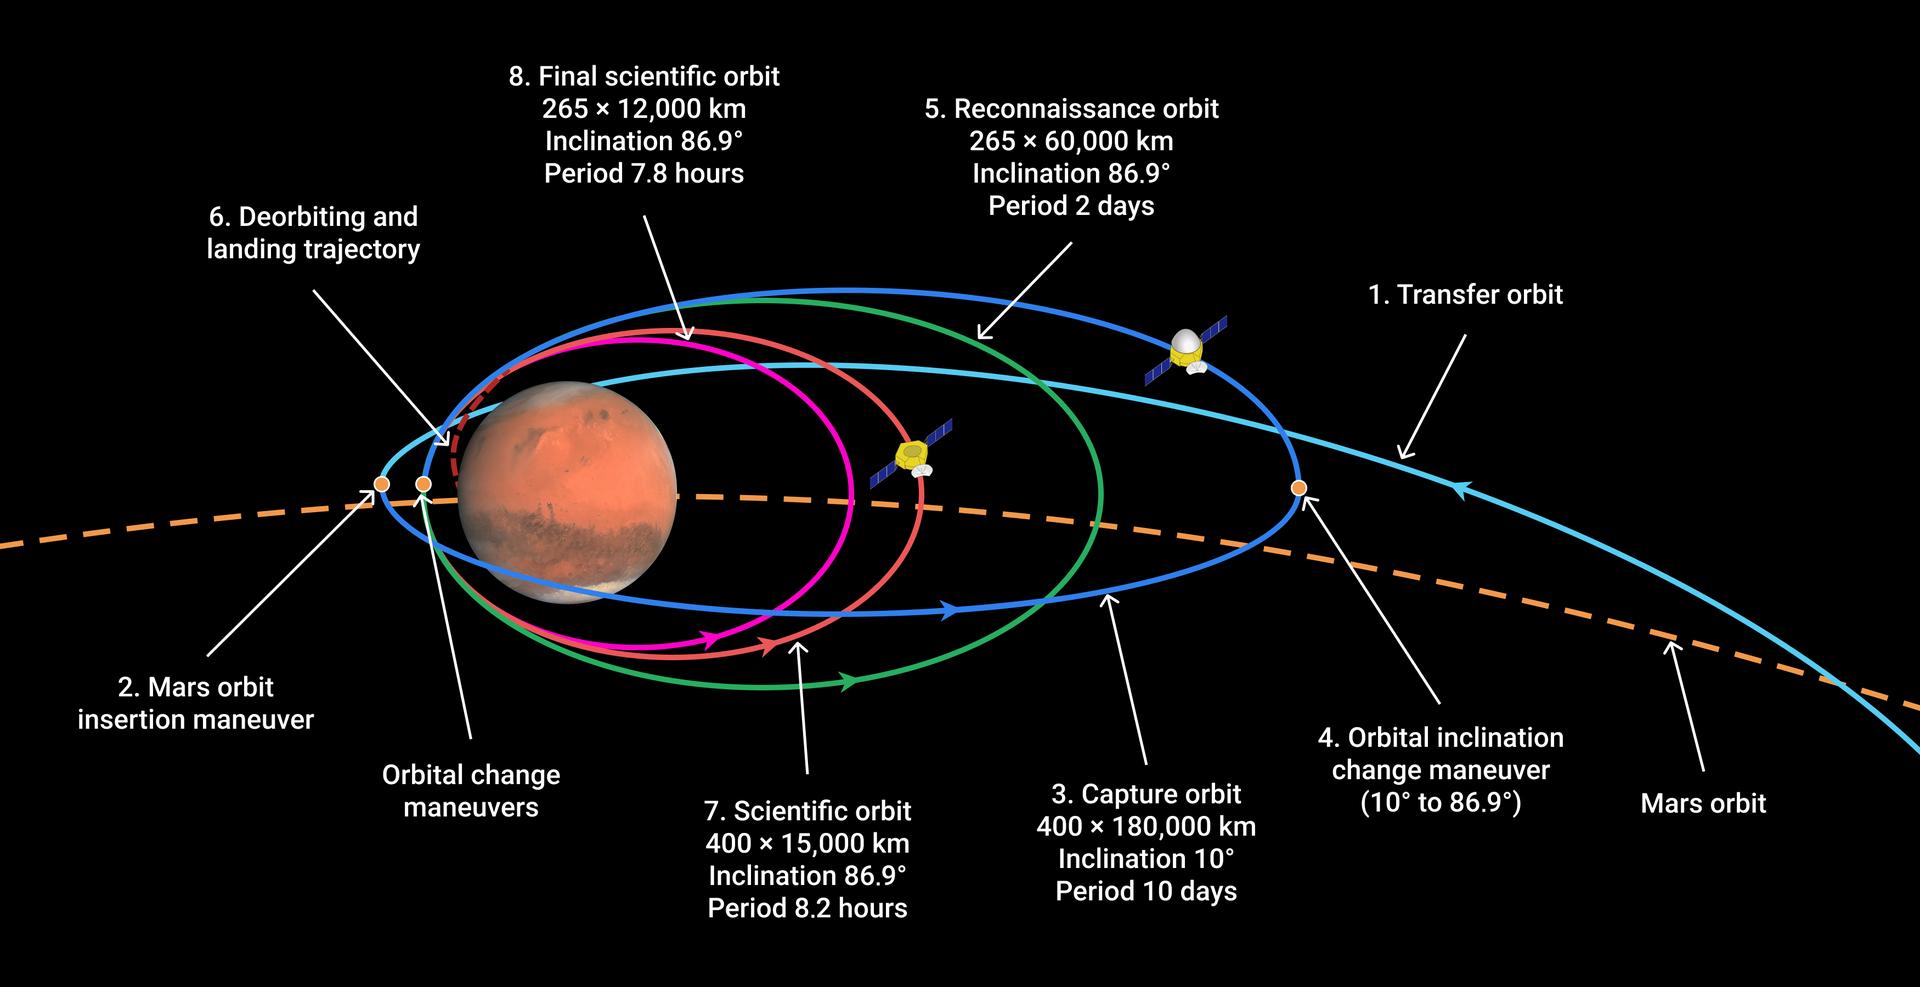 orbital_trajectory_of_tianwen-1_around_mars.png